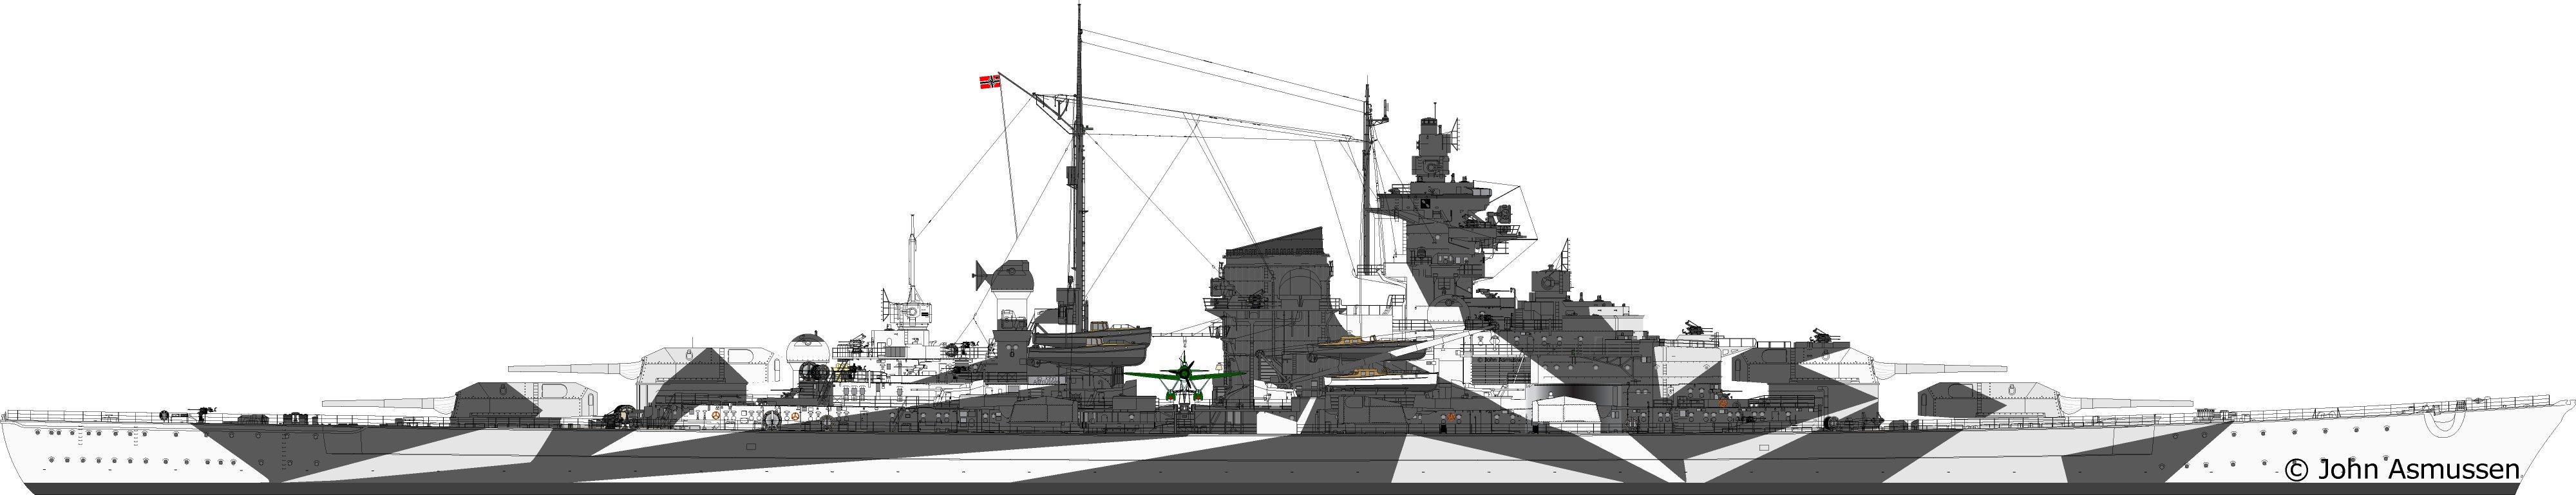 Tirpitz 1:350 Platinum Edition 18101912181323134915950527